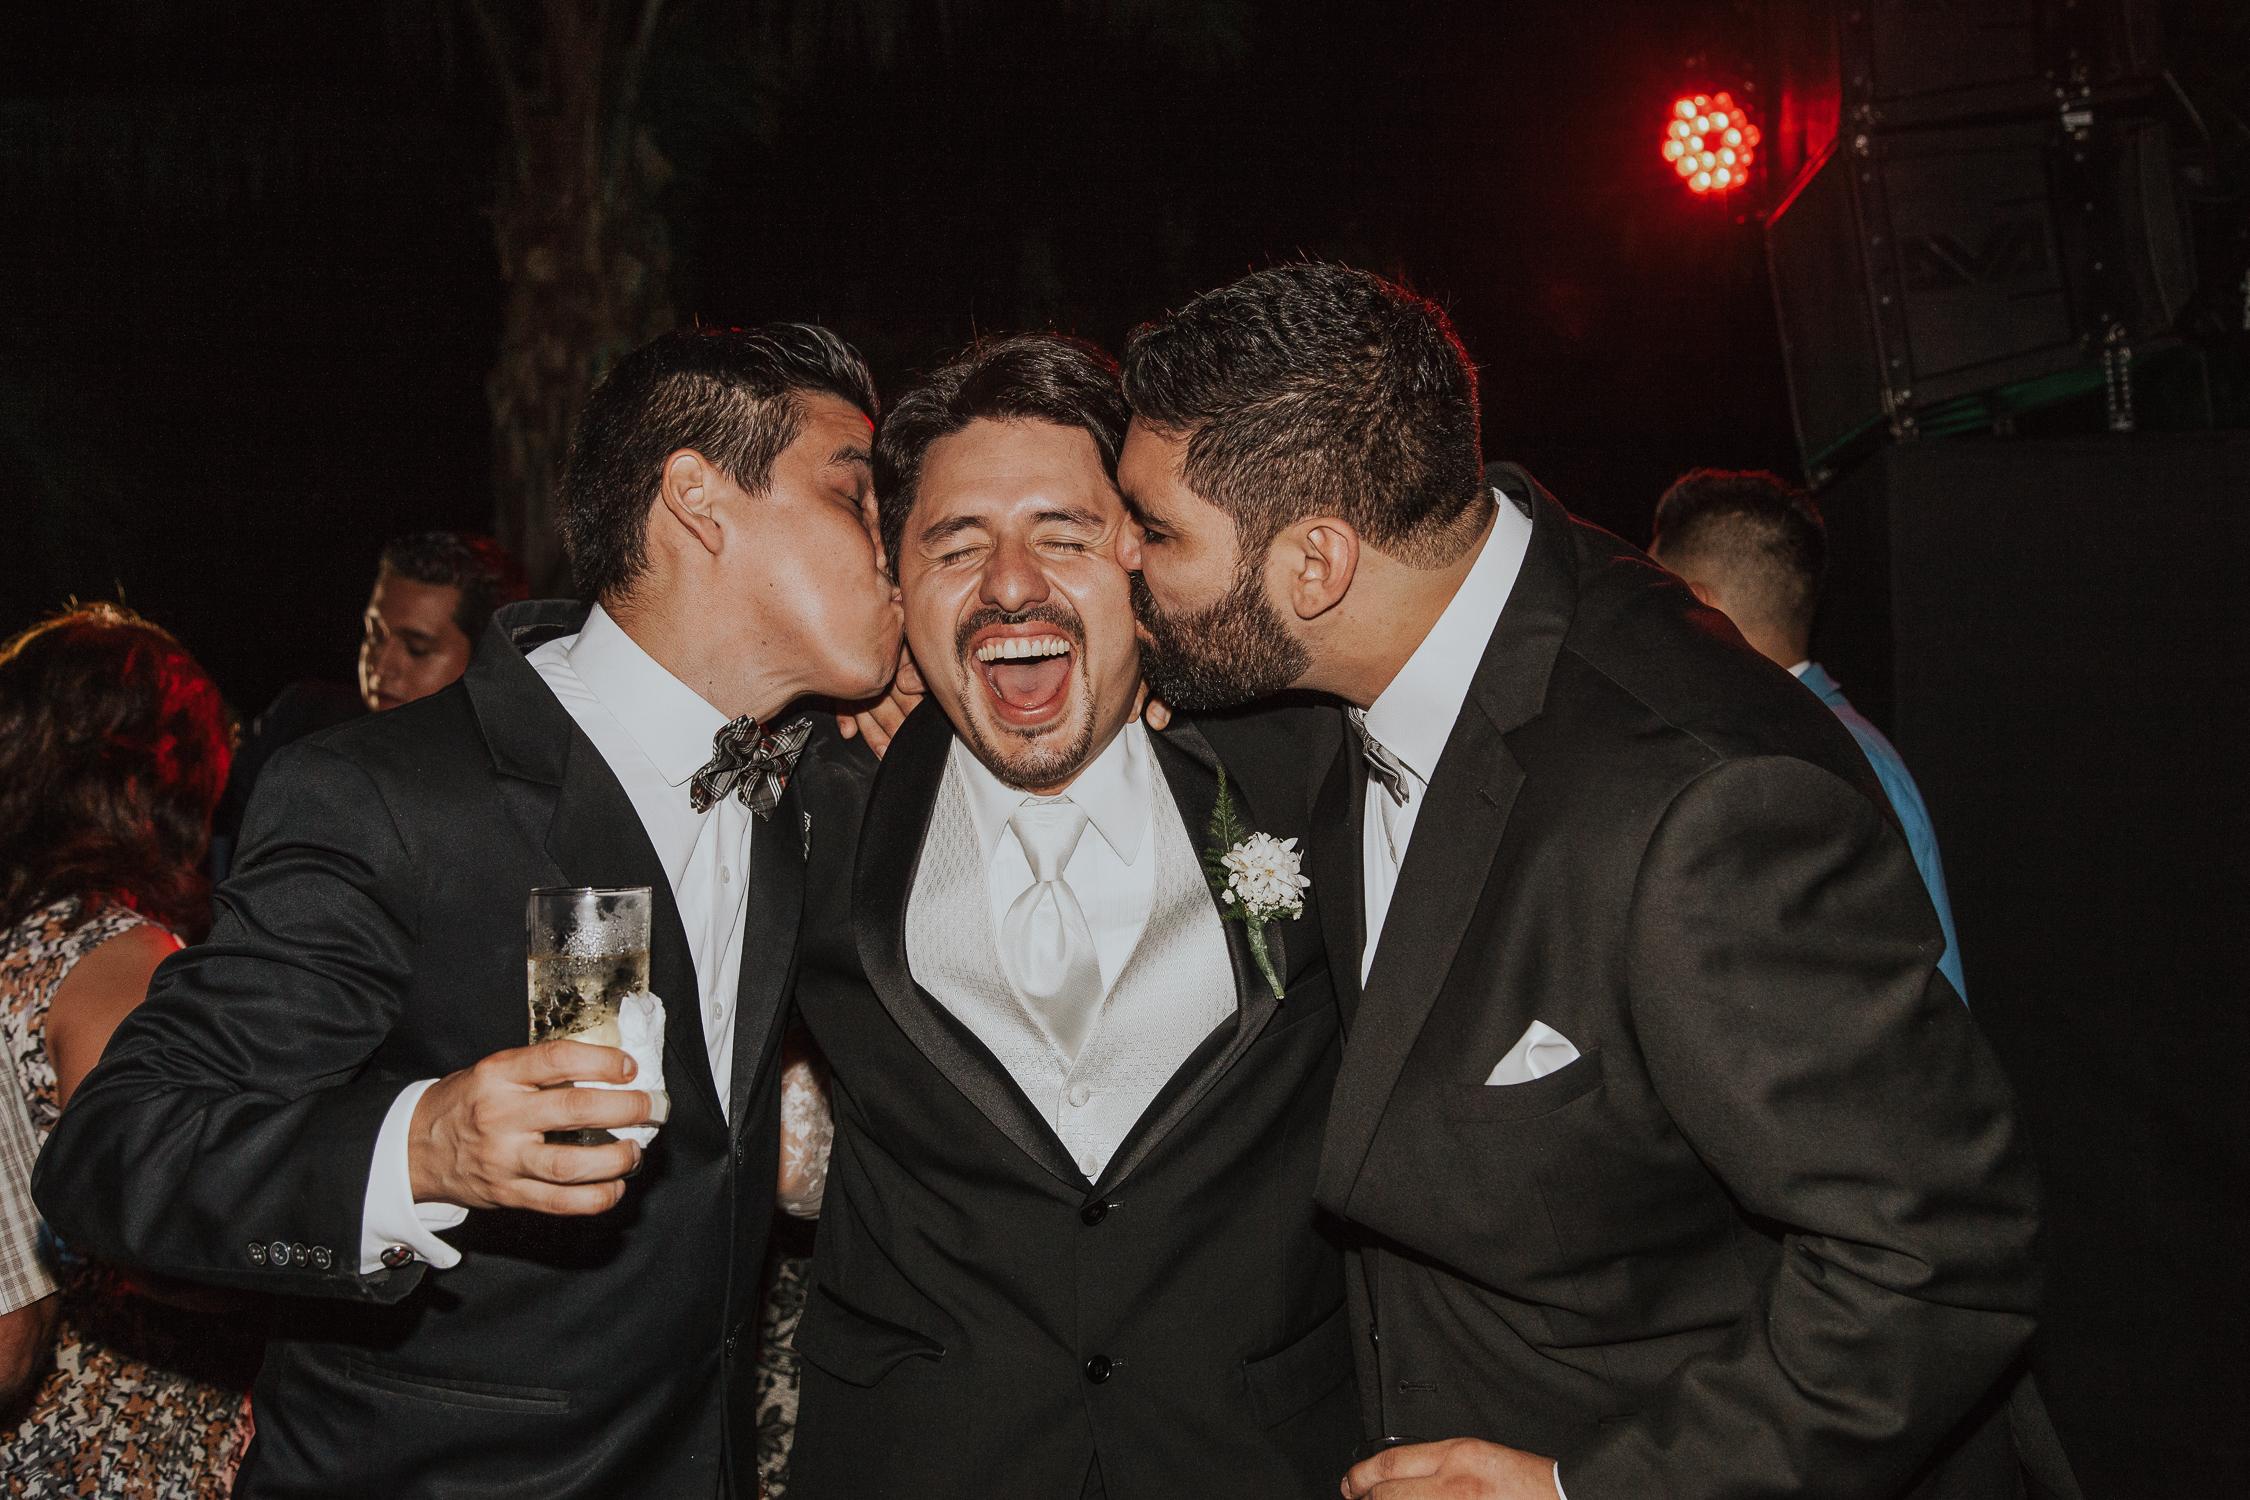 Michelle-Agurto-Fotografia-Bodas-Ecuador-Destination-Wedding-Photographer-Pauli-Edwin-34.JPG